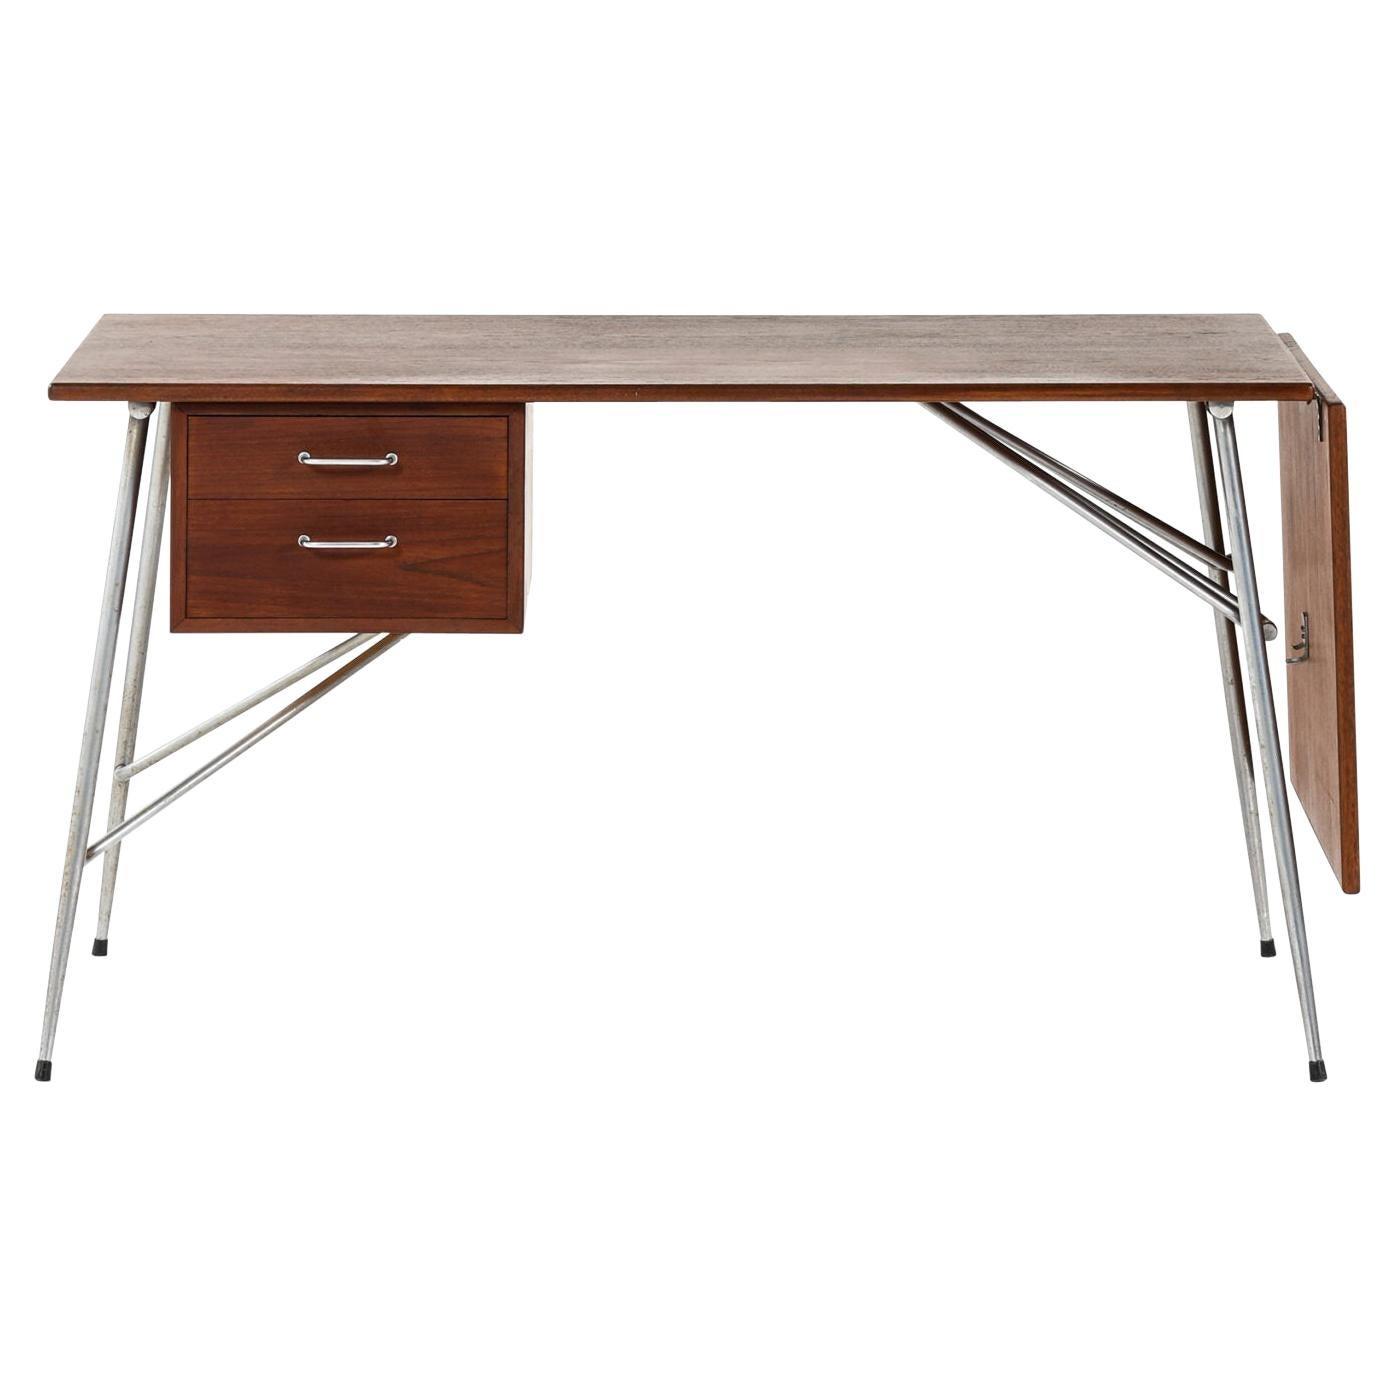 Børge Mogensen Desk Produced by Søborg Møbler in Denmark